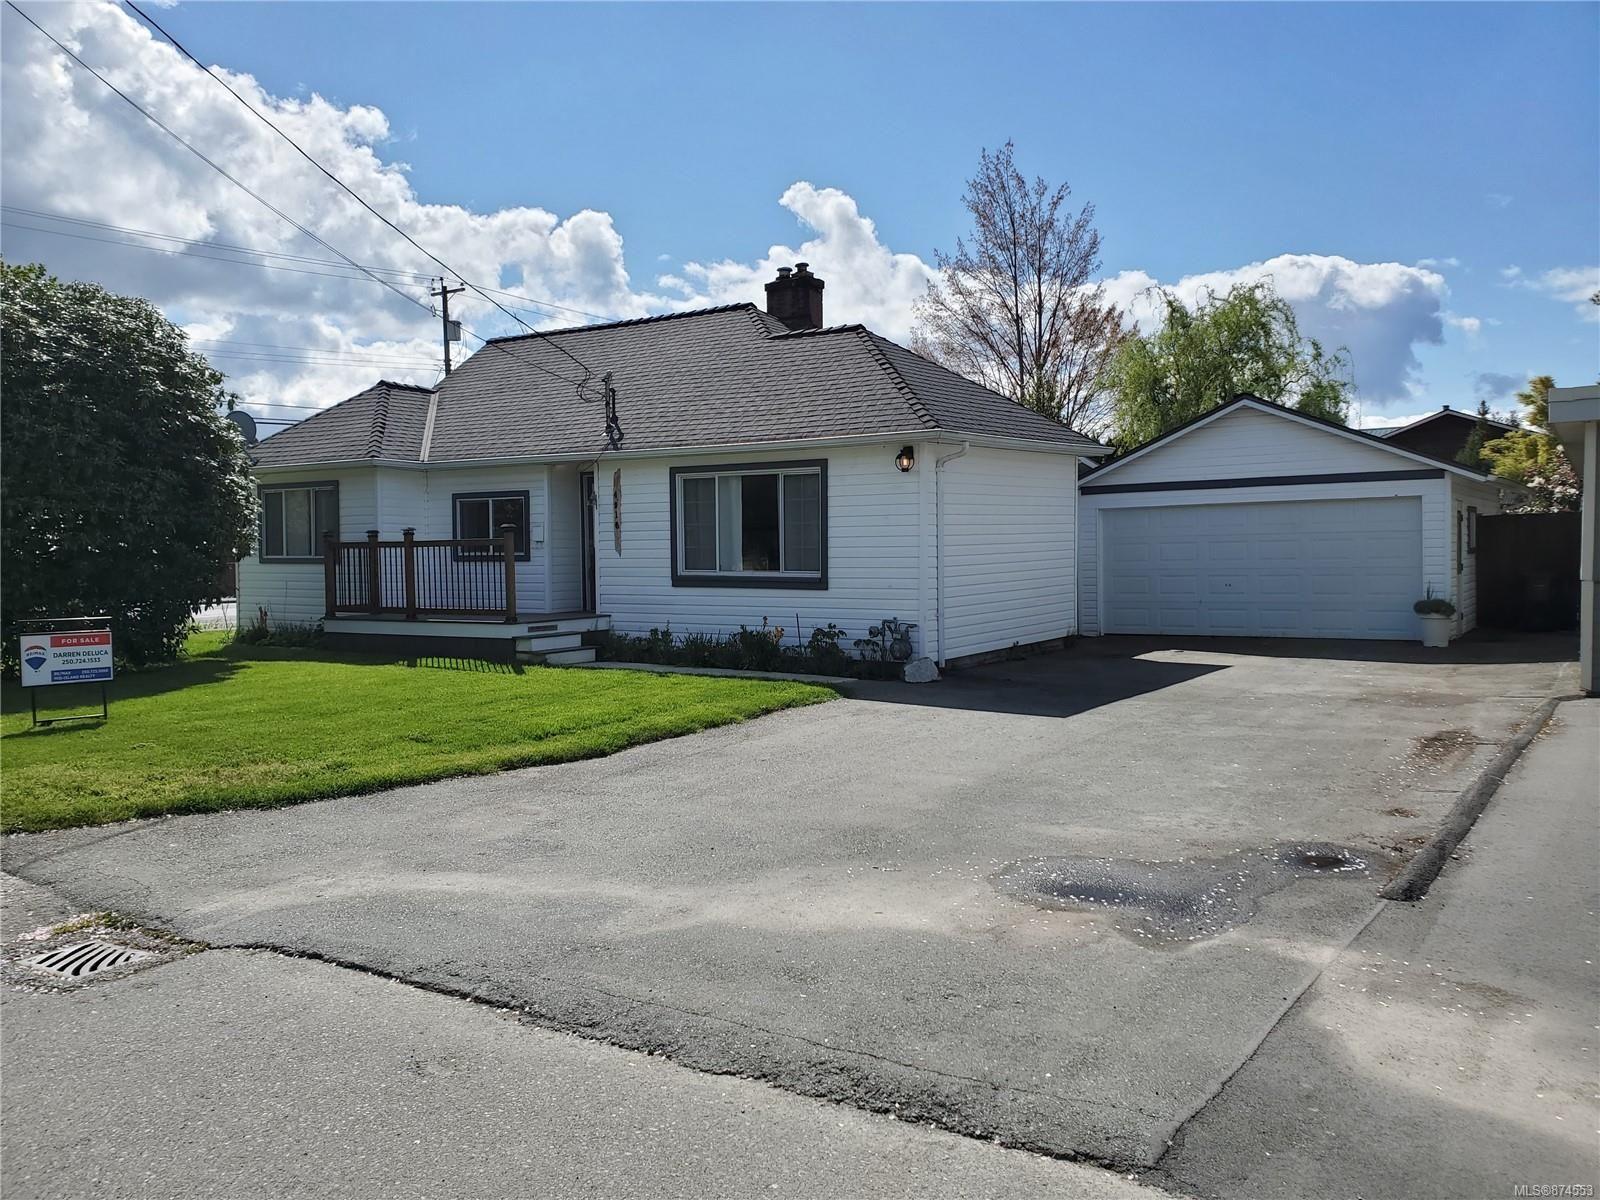 Main Photo: 4916 Lathom Rd in : PA Port Alberni House for sale (Port Alberni)  : MLS®# 874553